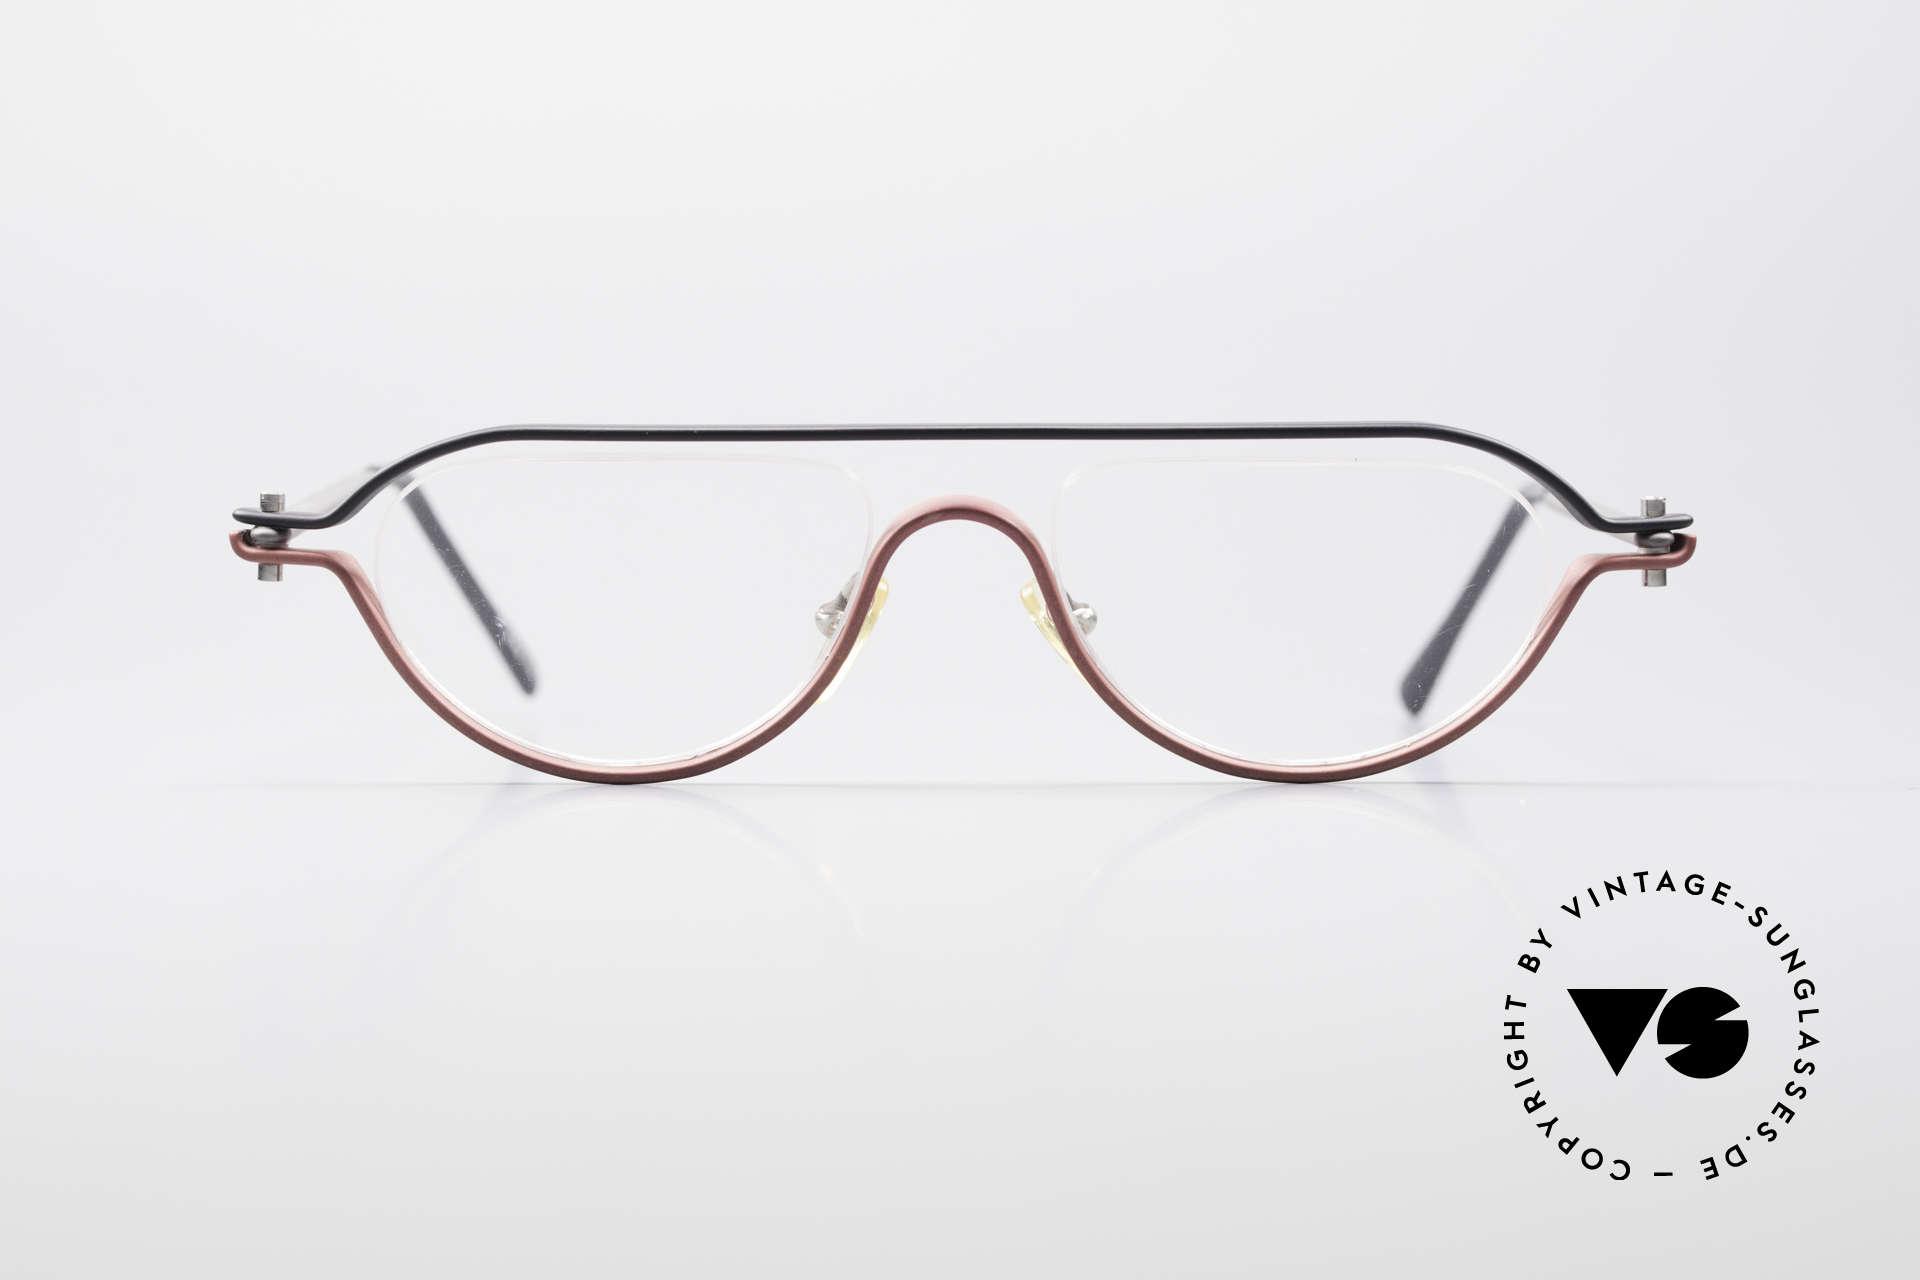 5cdf8e2e38 Glasses ProDesign No9 The Hunt For Red October